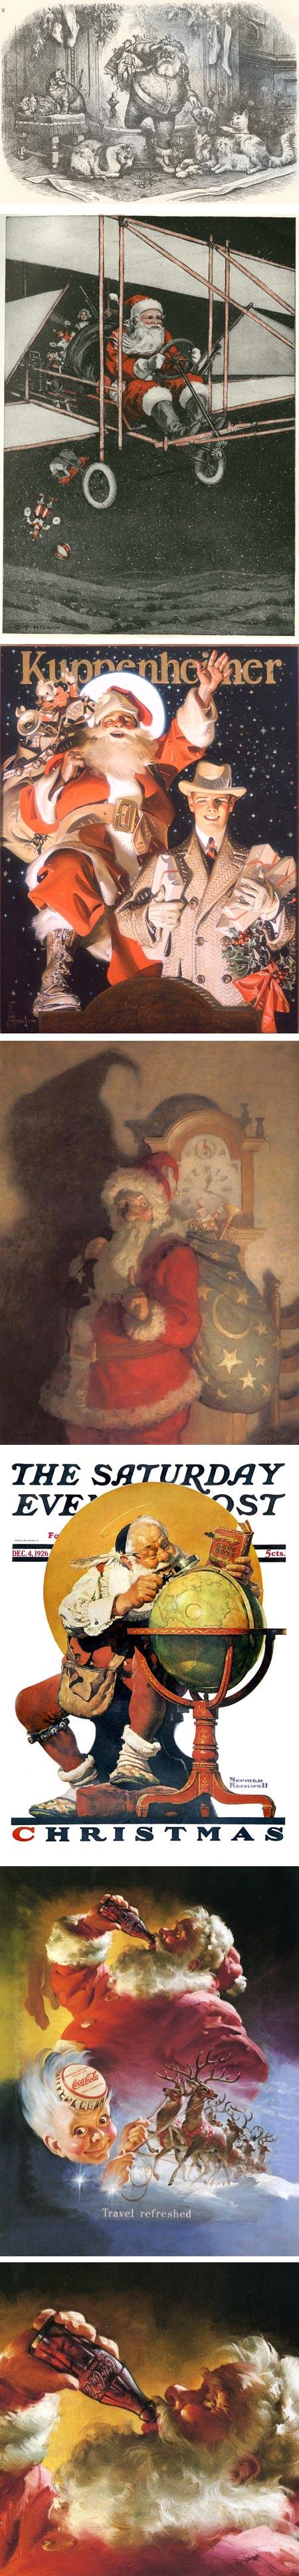 Illustrator's Visions of Santa Claus: Thomas Nast, Reginald Birch, J.C. Leyendecker, N.C. Wyeth, Norman Rockwell, Haddon Sundblom